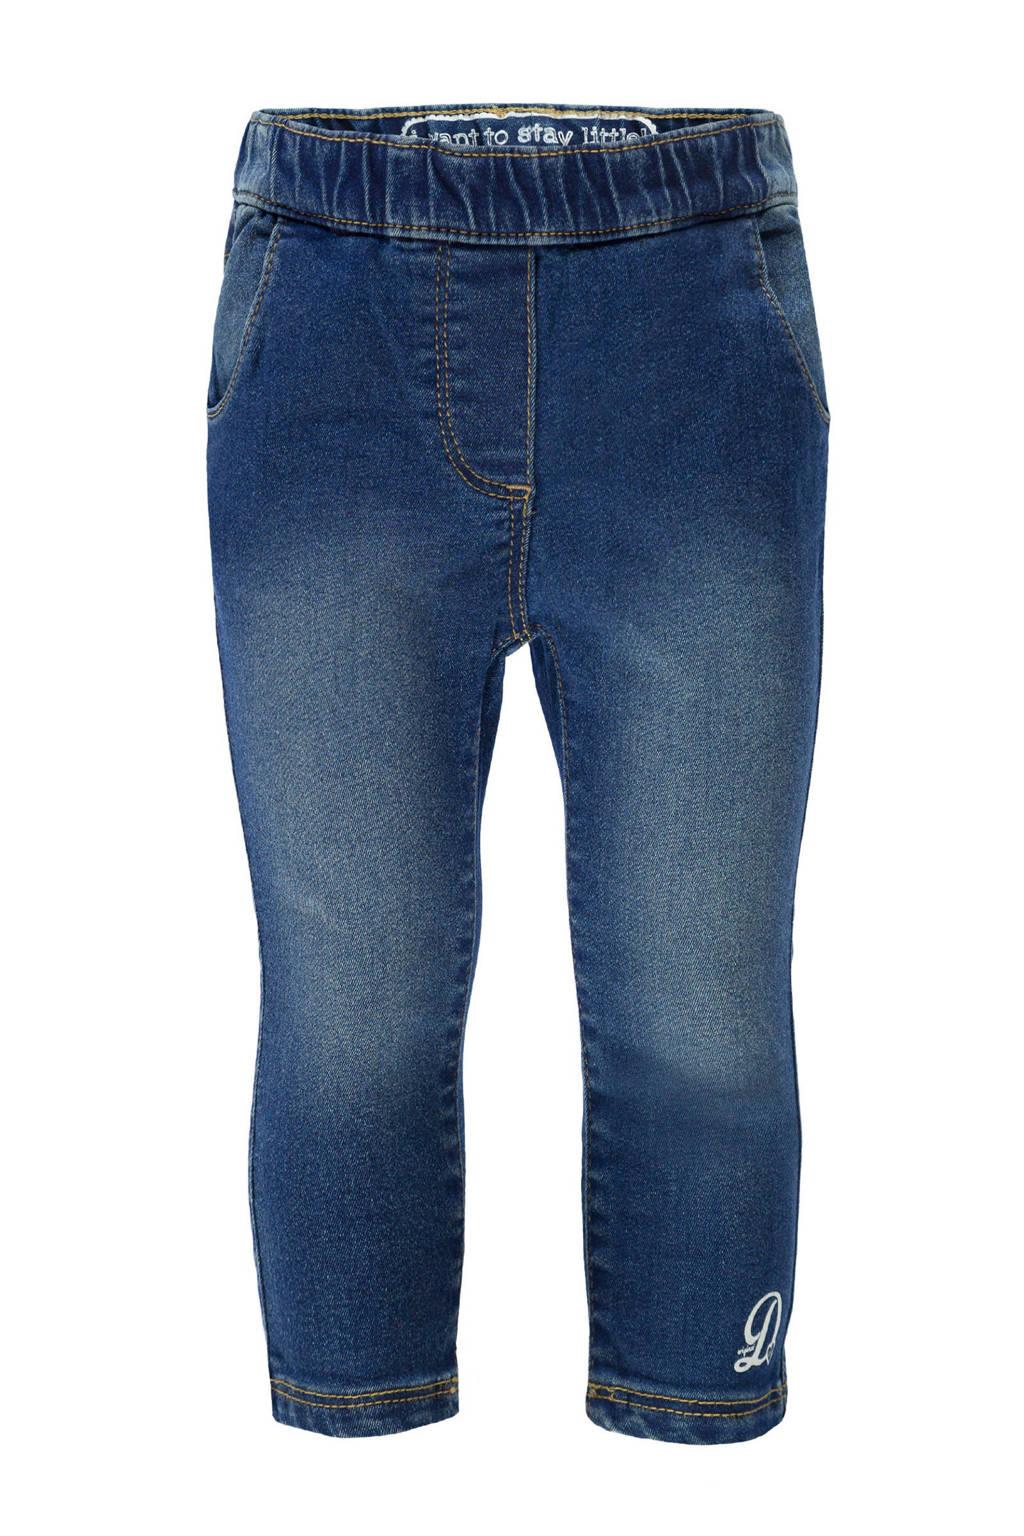 lief! skinny jeans donkerblauw, Donkerblauw